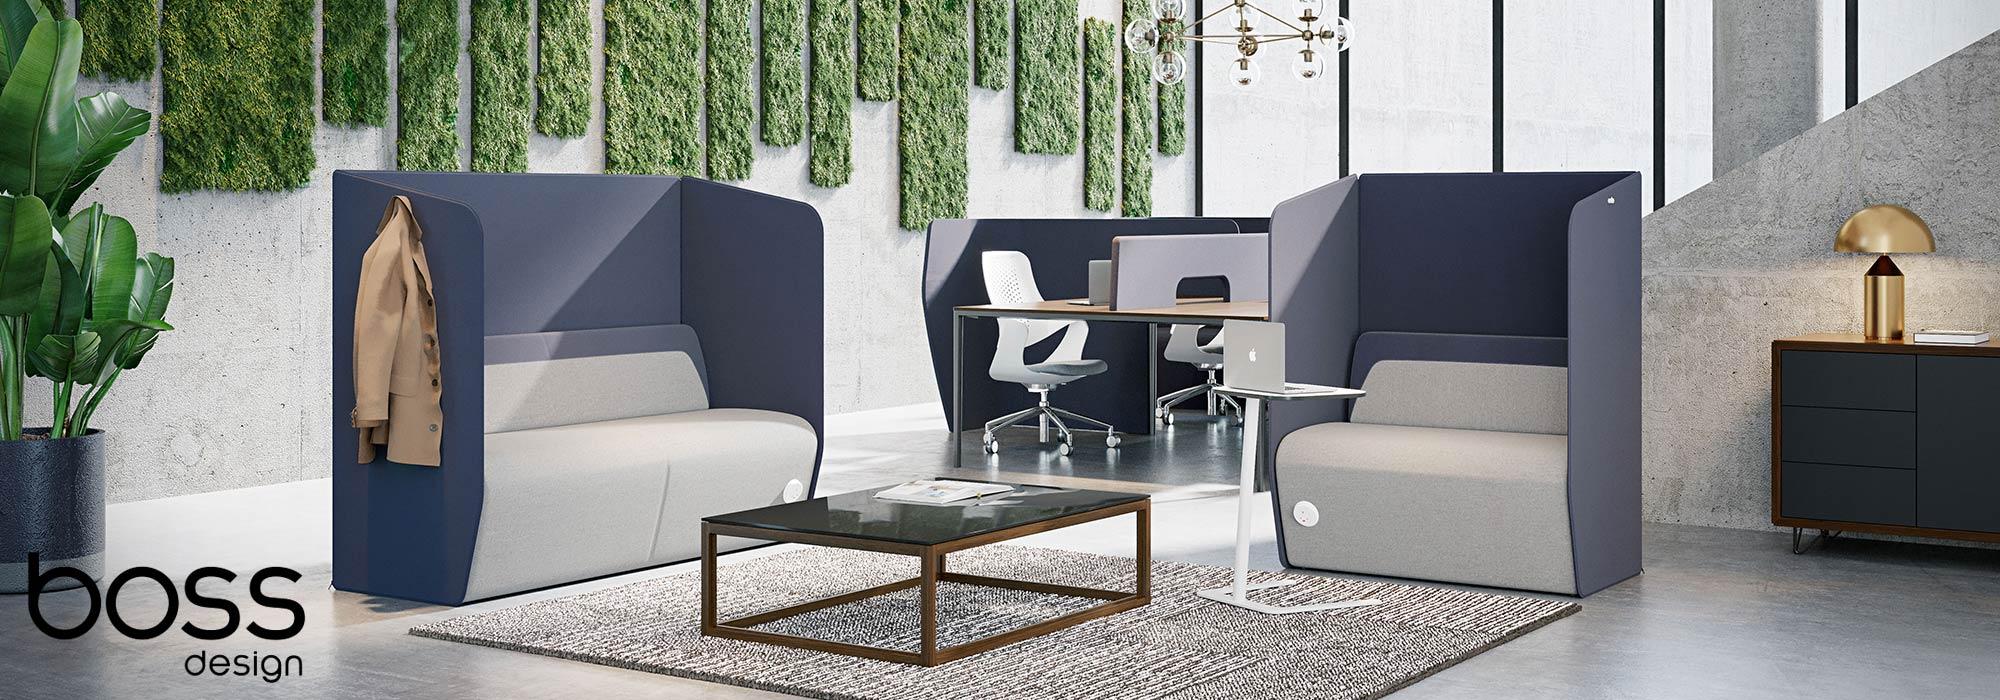 Boss Design Hemm Seating